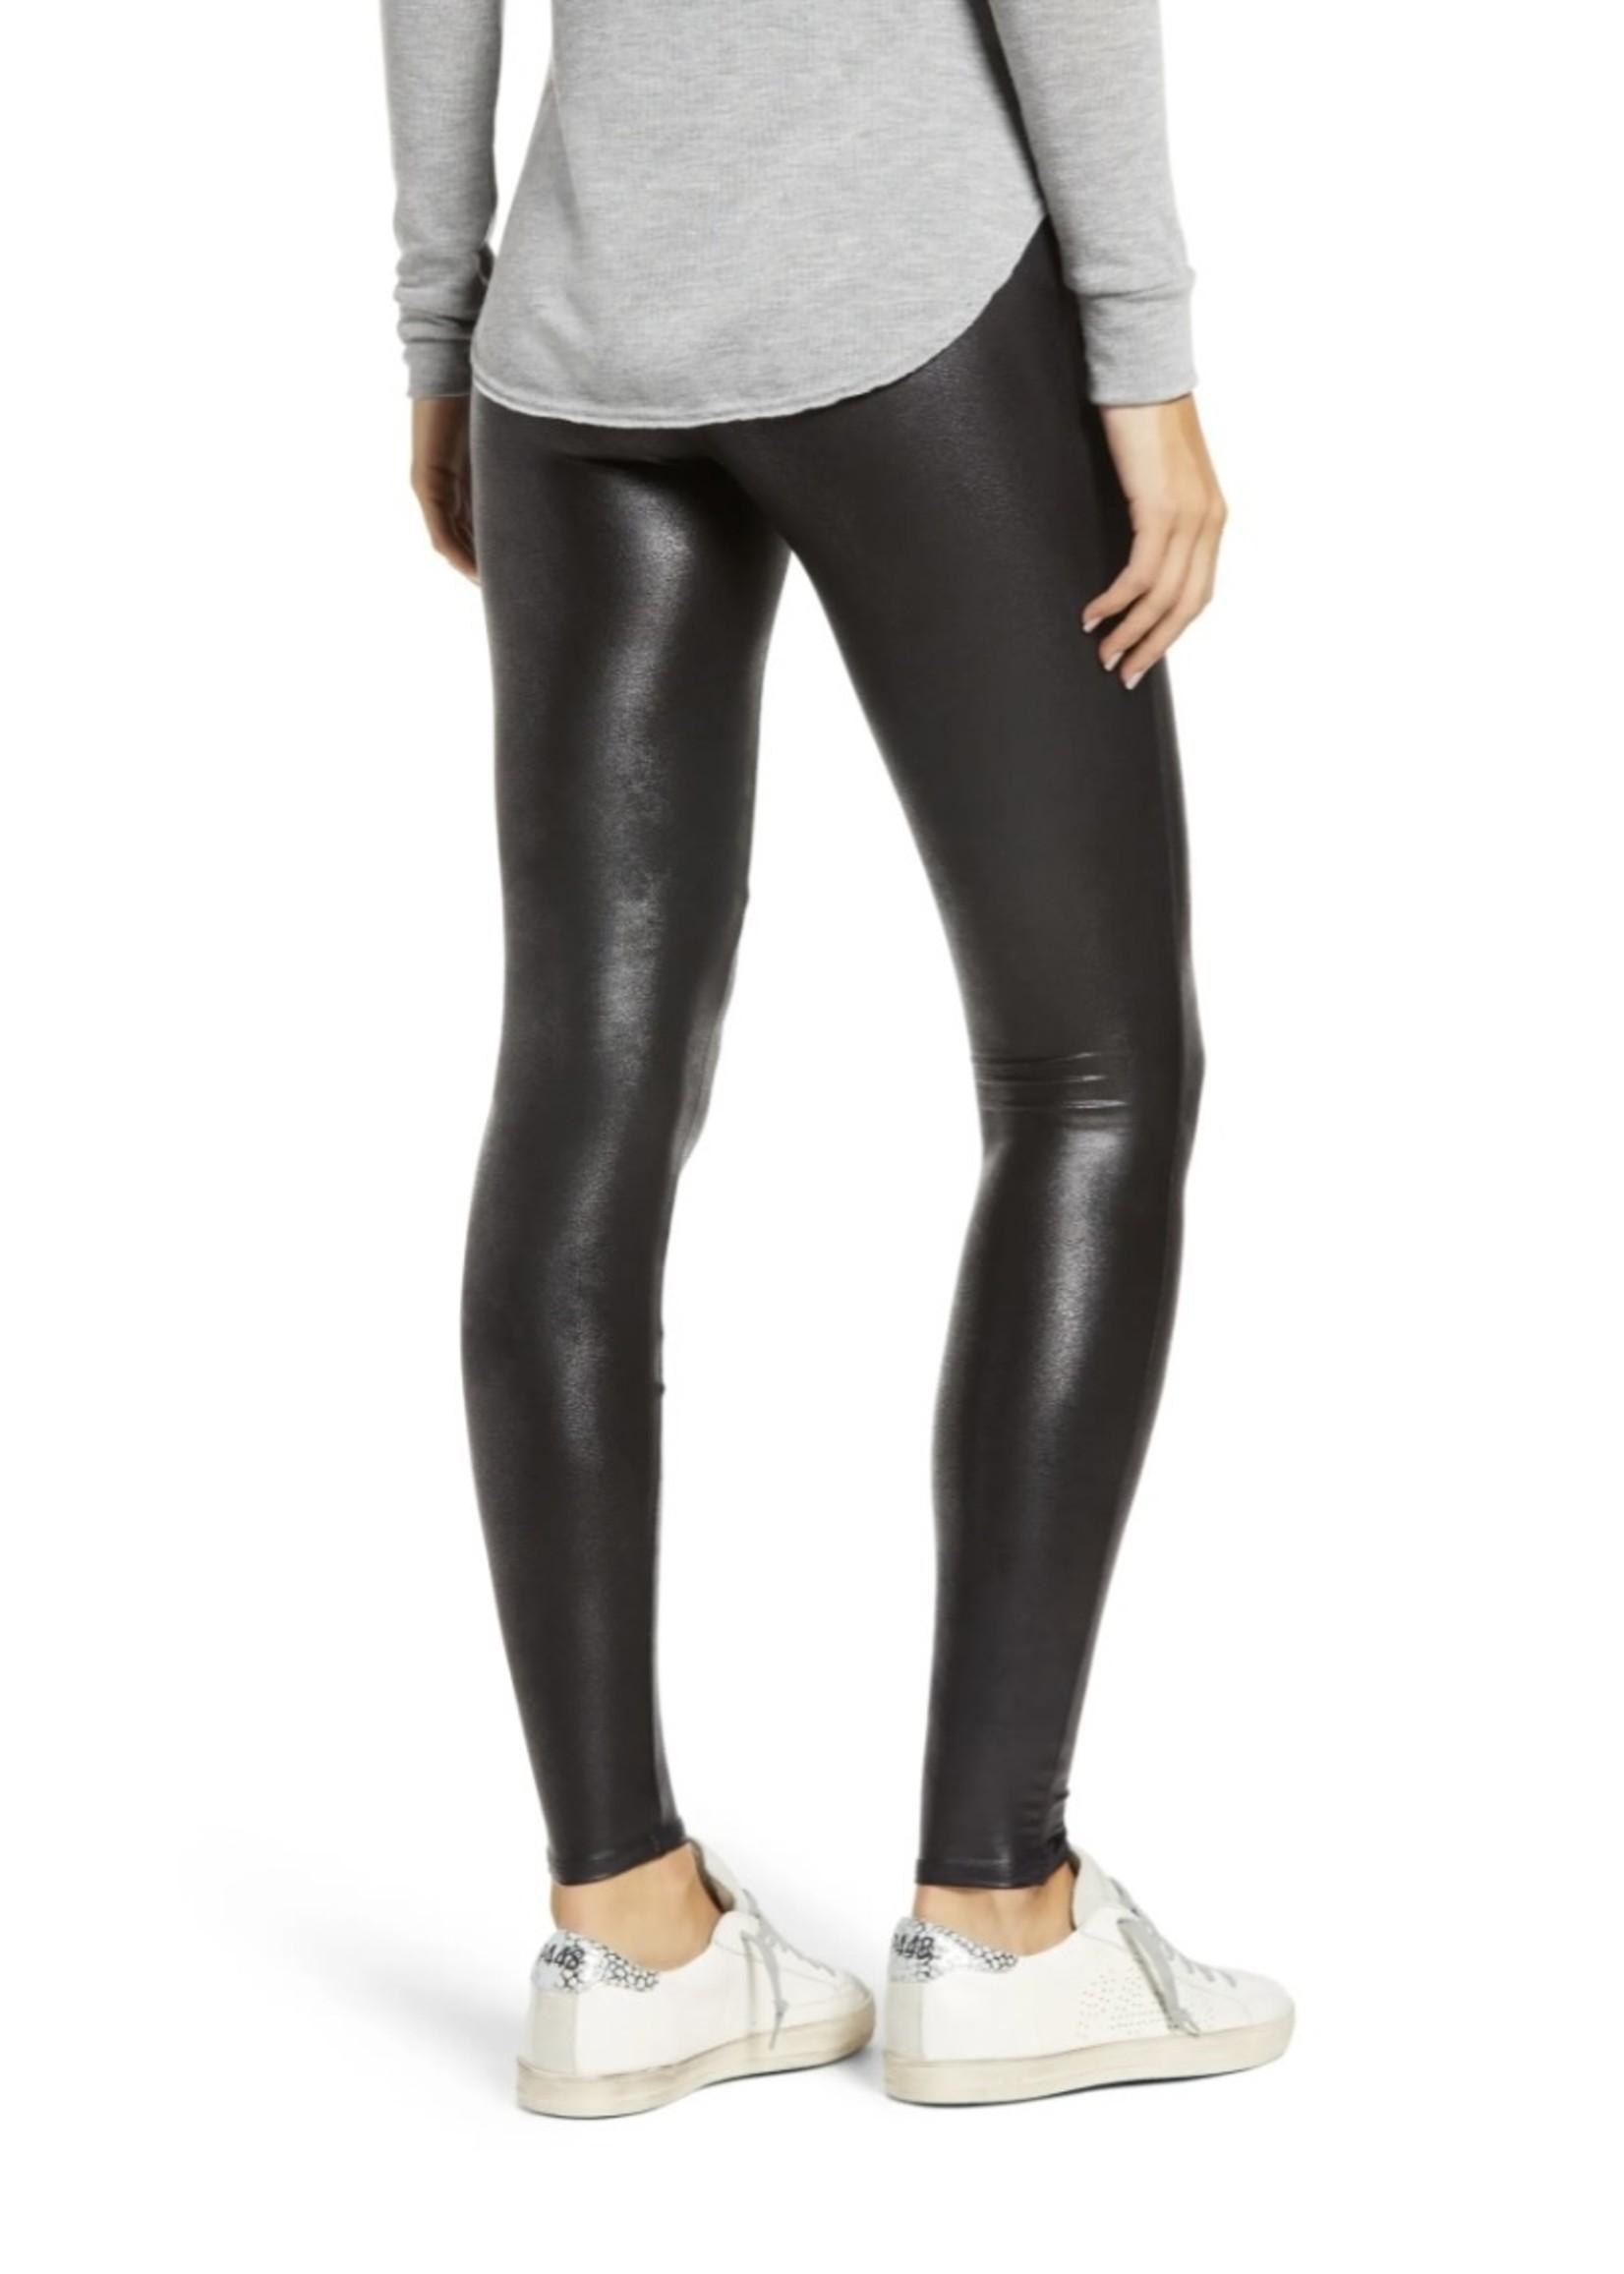 Spanx PETITE Faux Leather Leggings - 2437Q